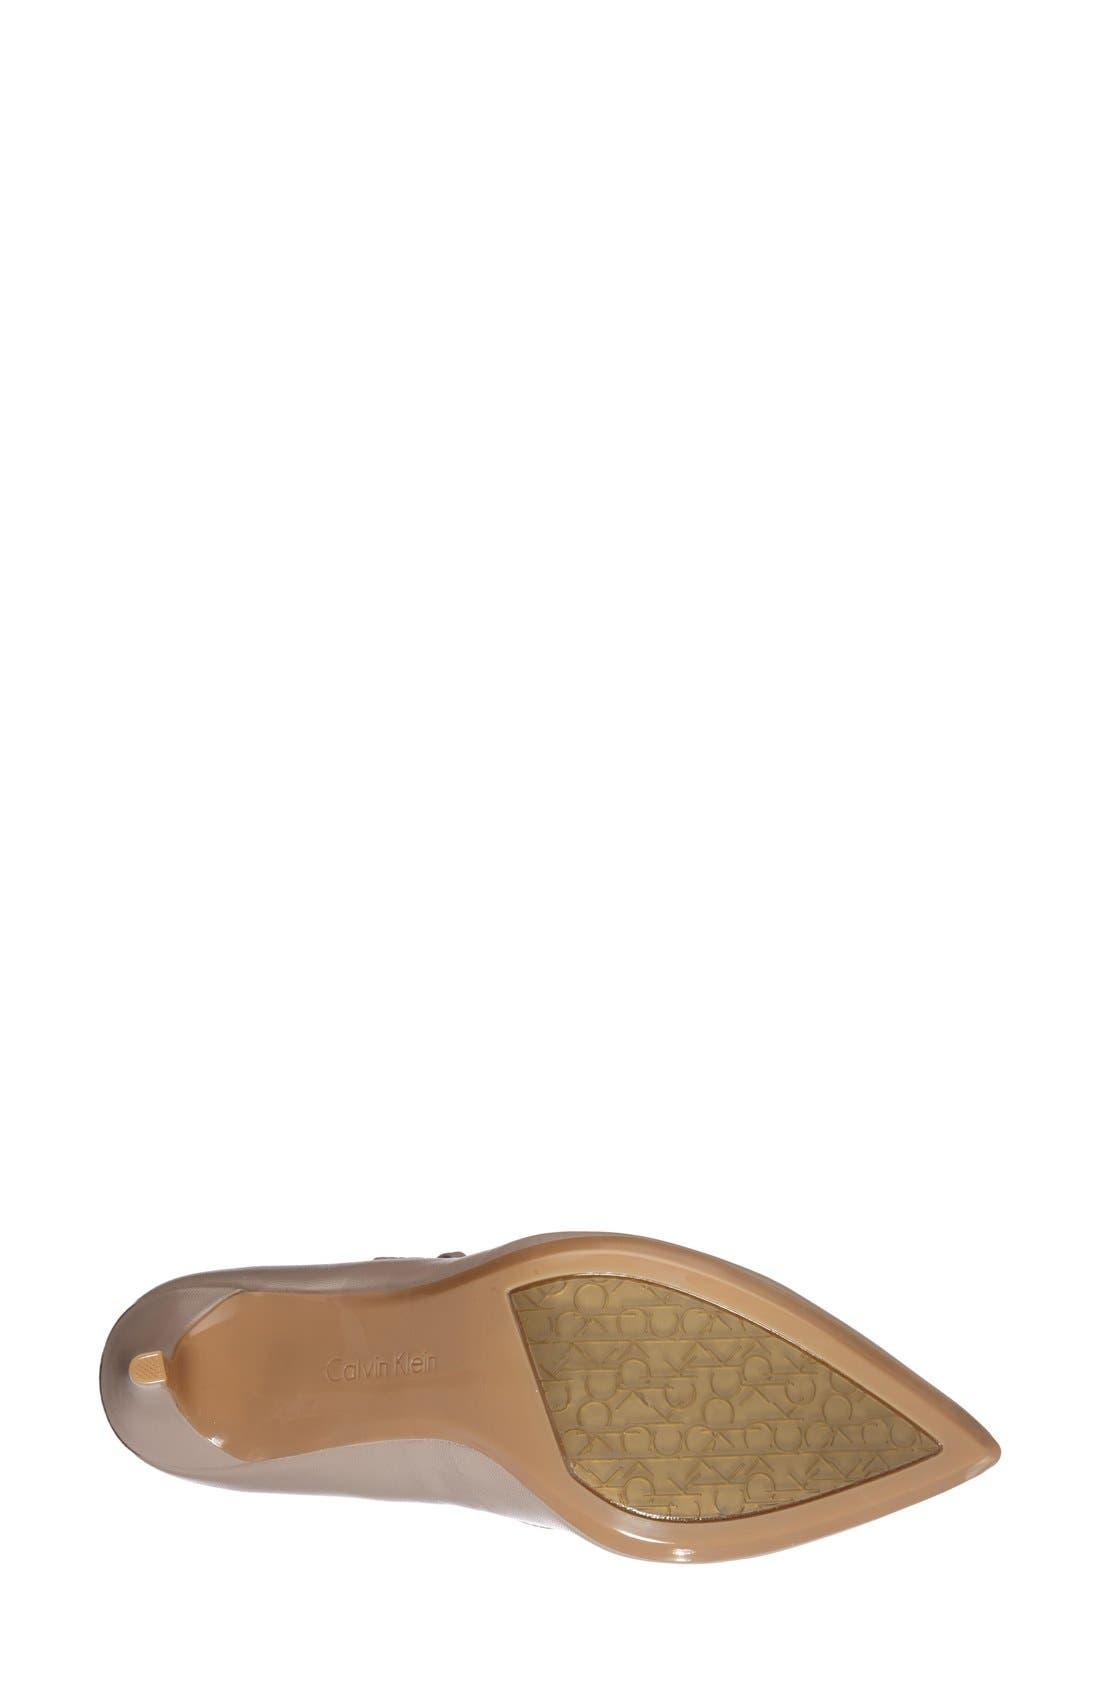 Alternate Image 4  - Calvin Klein 'Genavee' Pointy Toe Pump (Women)